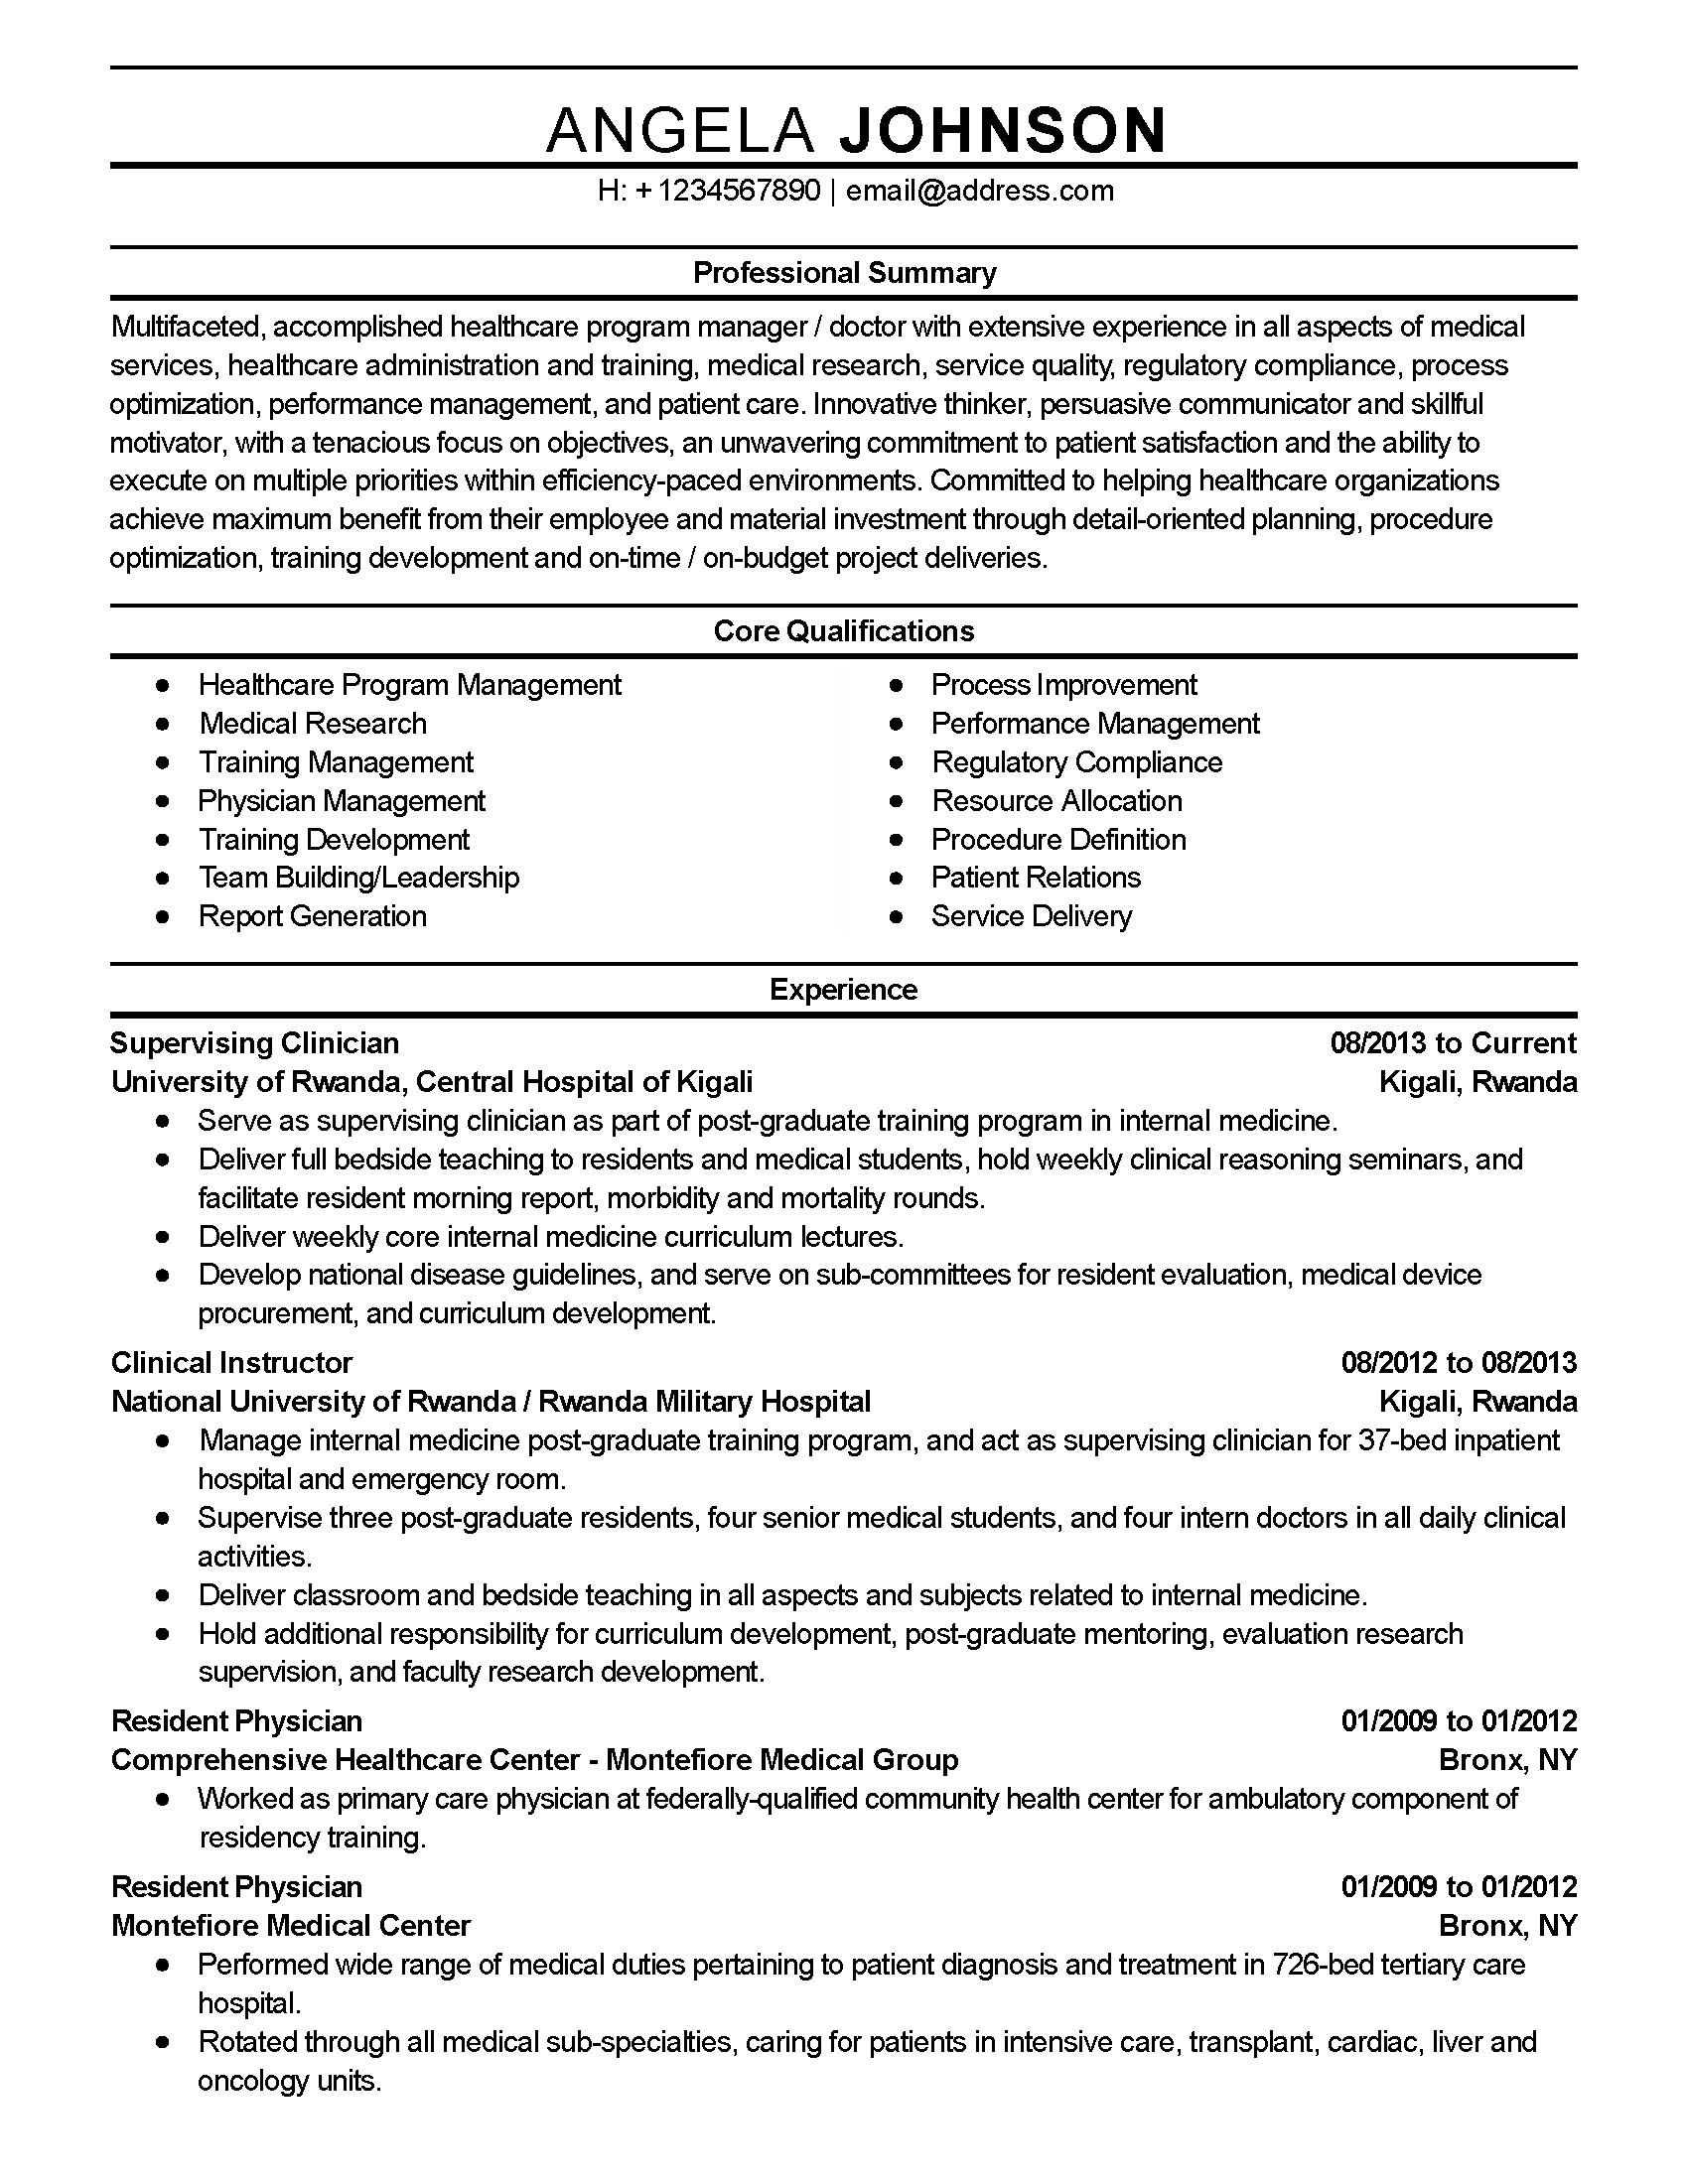 resume samples software knowledge 8 16 12 resume samples version